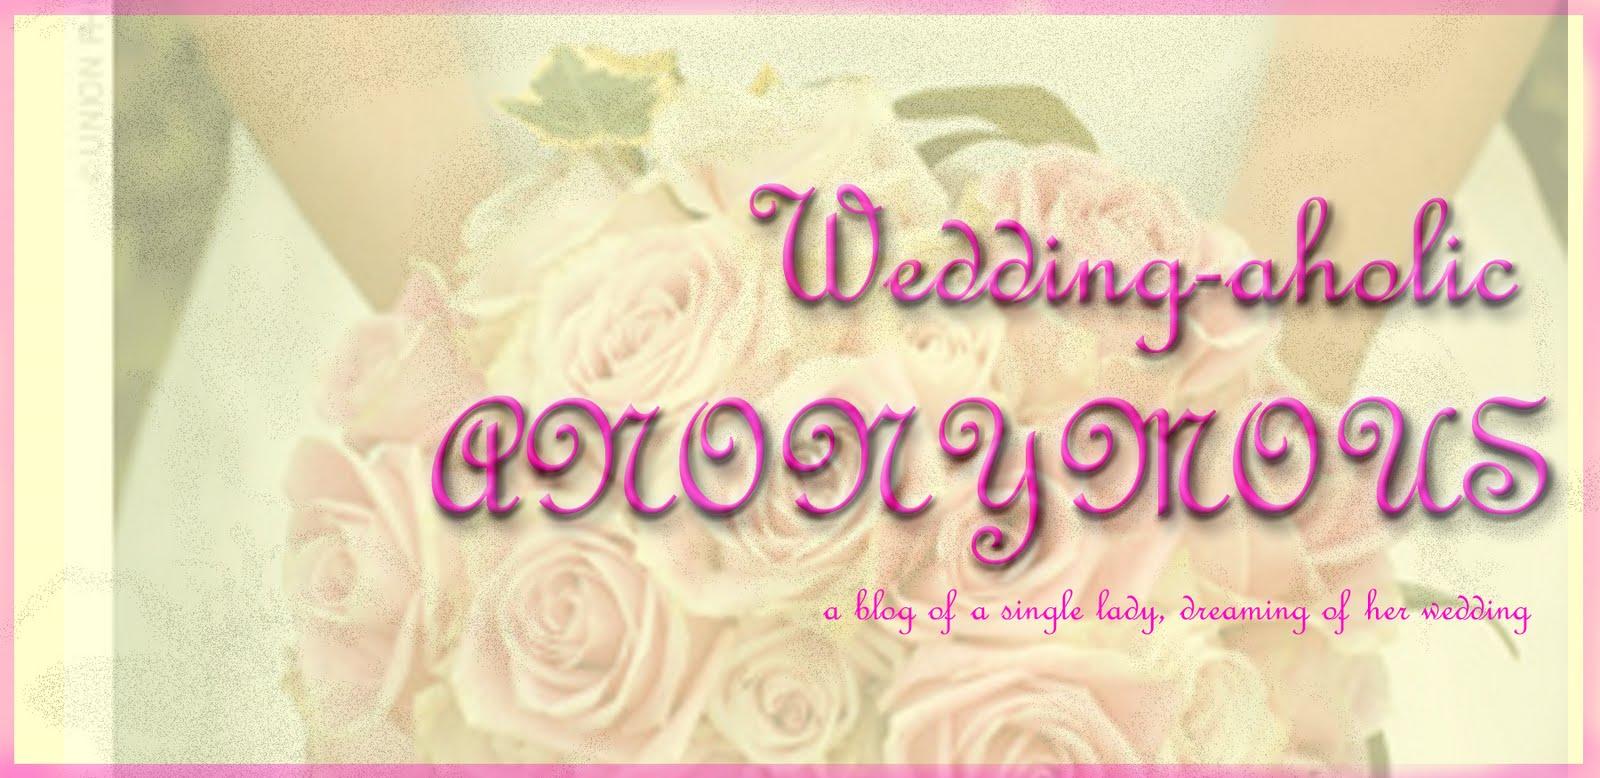 Wedding-aholic Anonymous: A Disney Princess Wedding: Belle